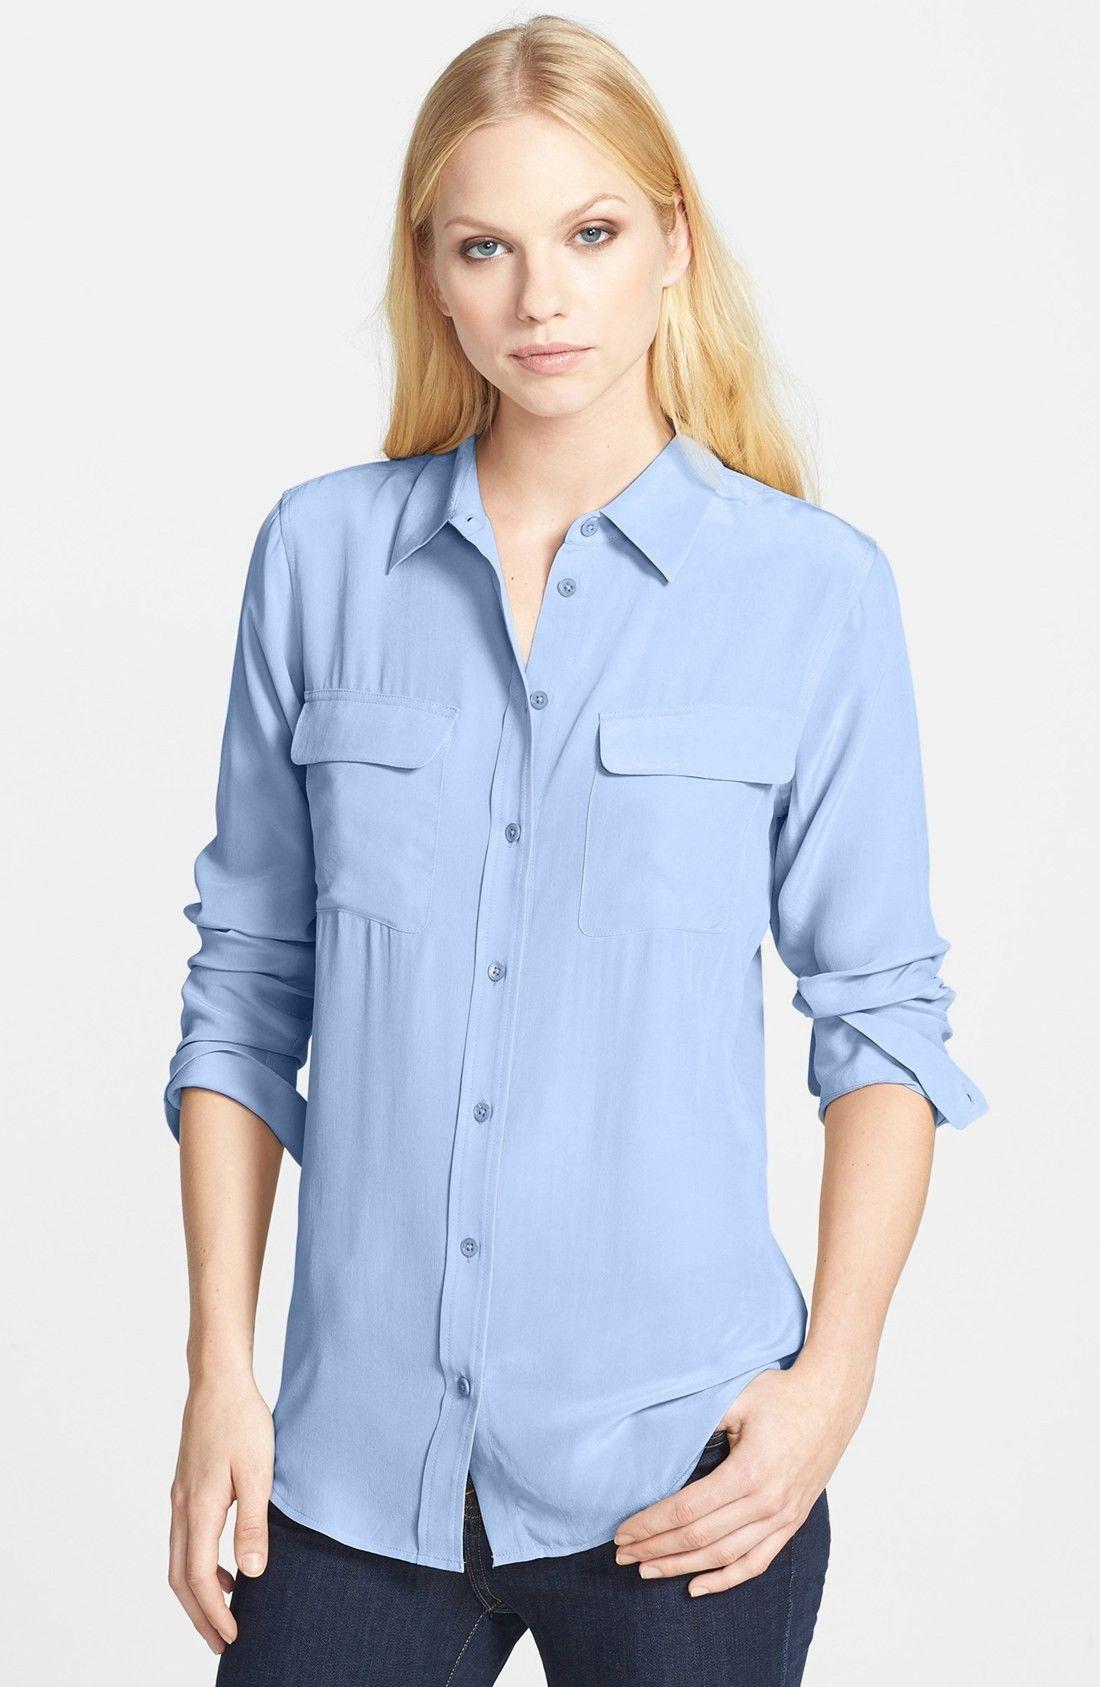 Collared Shirts For Womens Joe Maloy